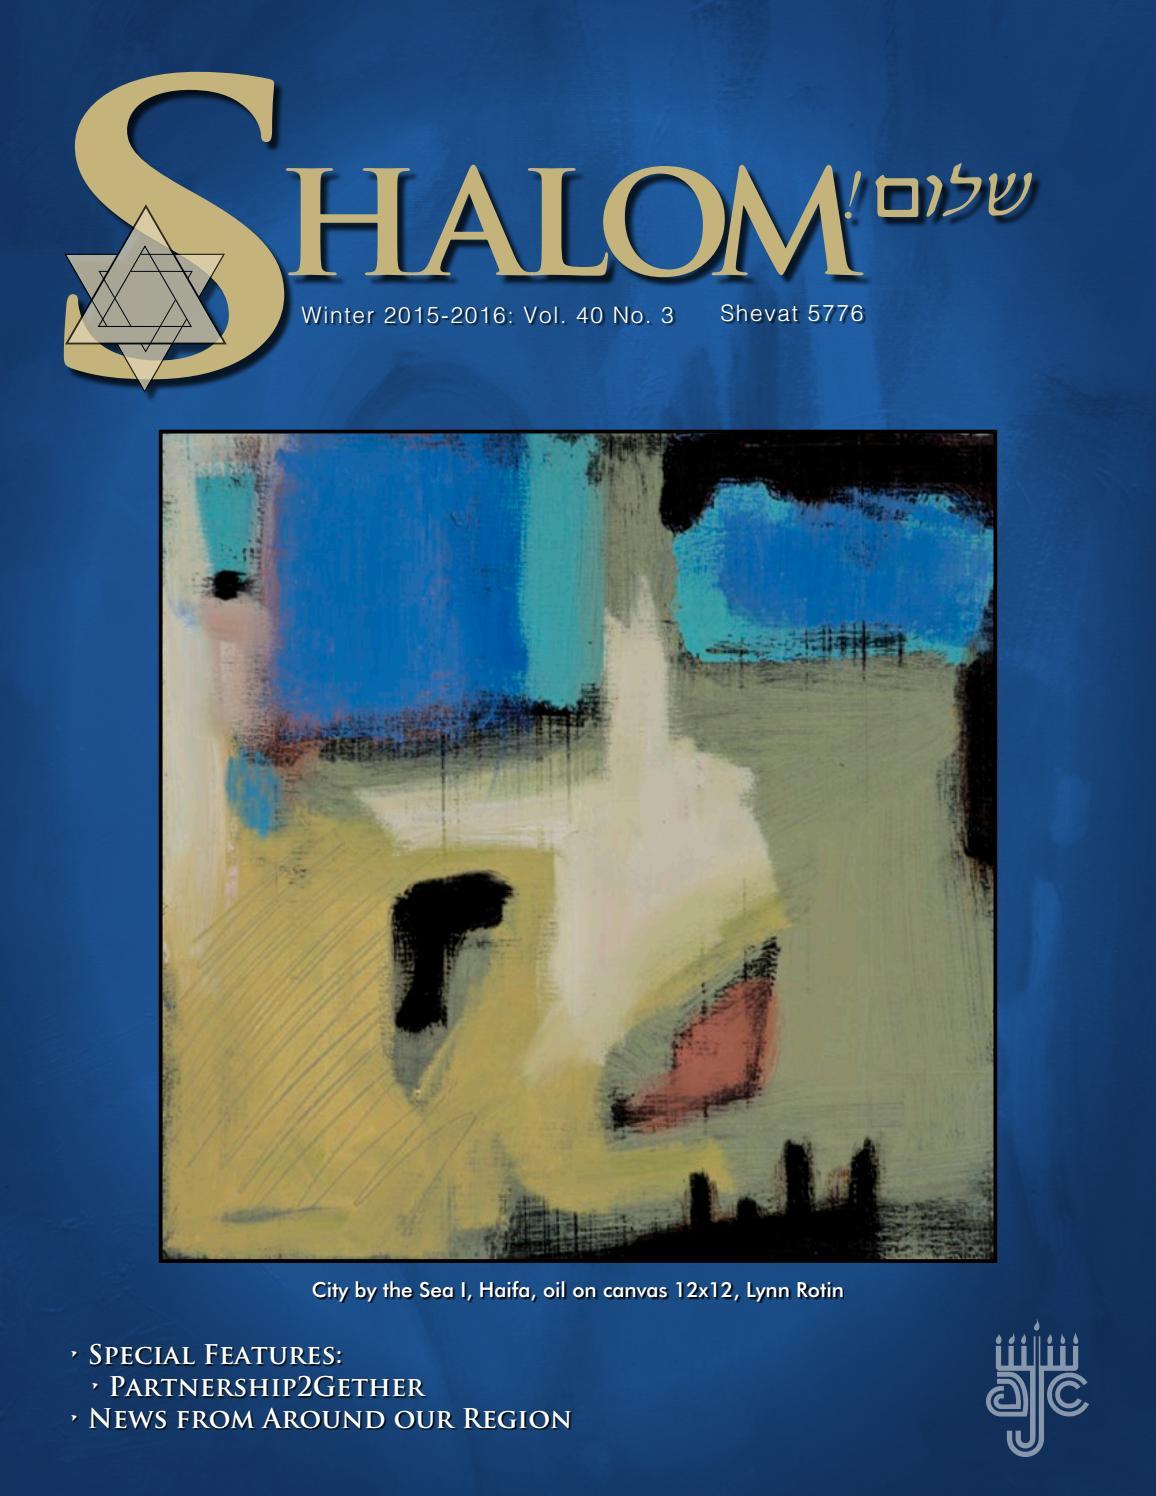 Shalom Magazine Winter 2015-2016